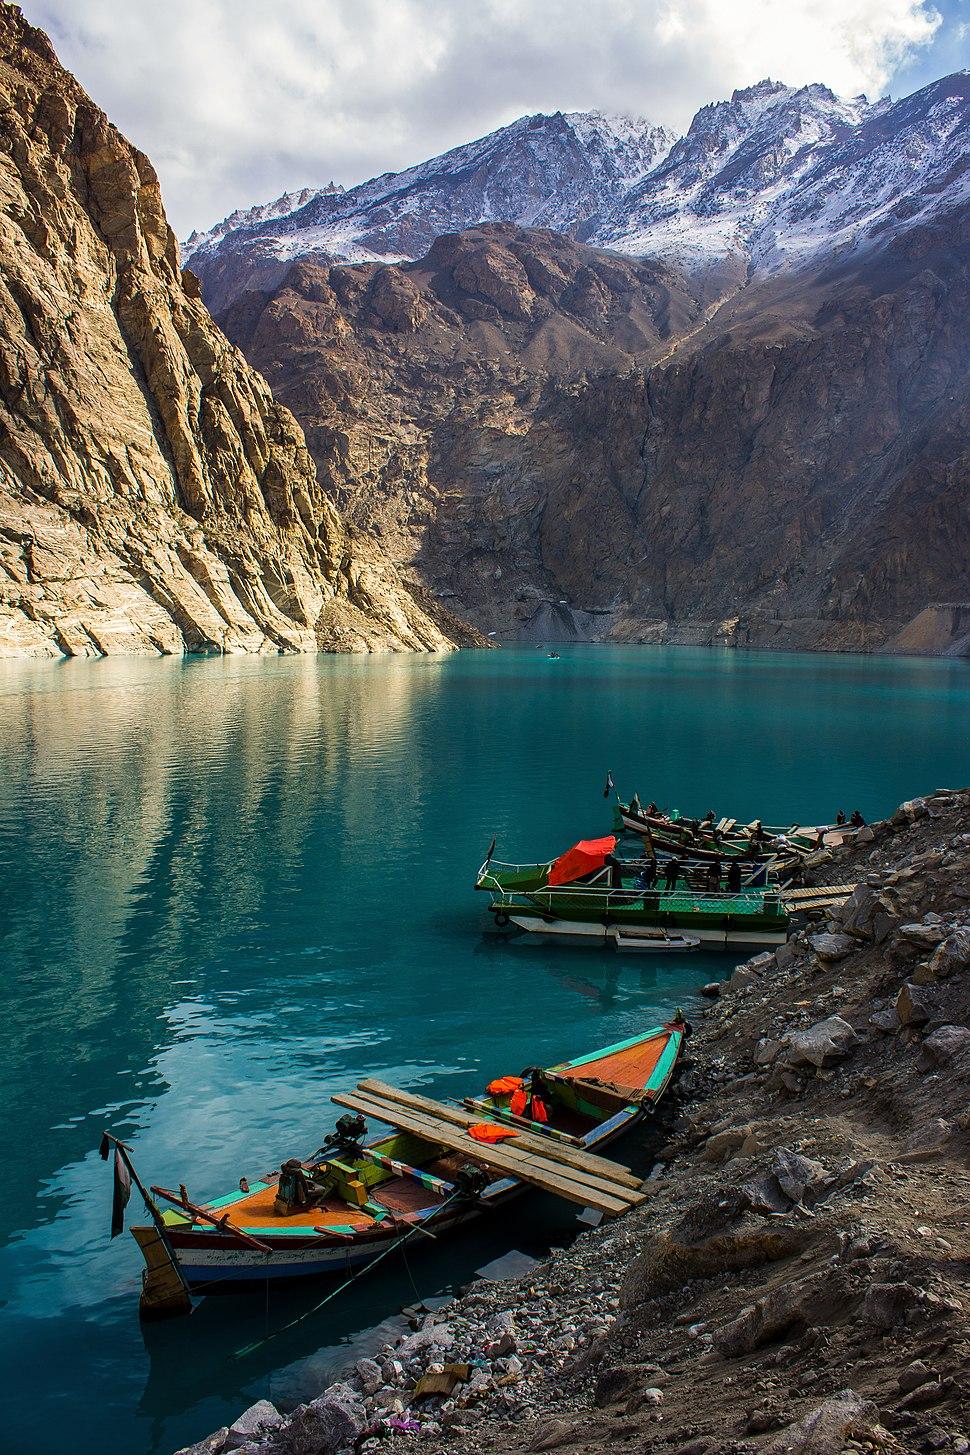 The Attabad Lake